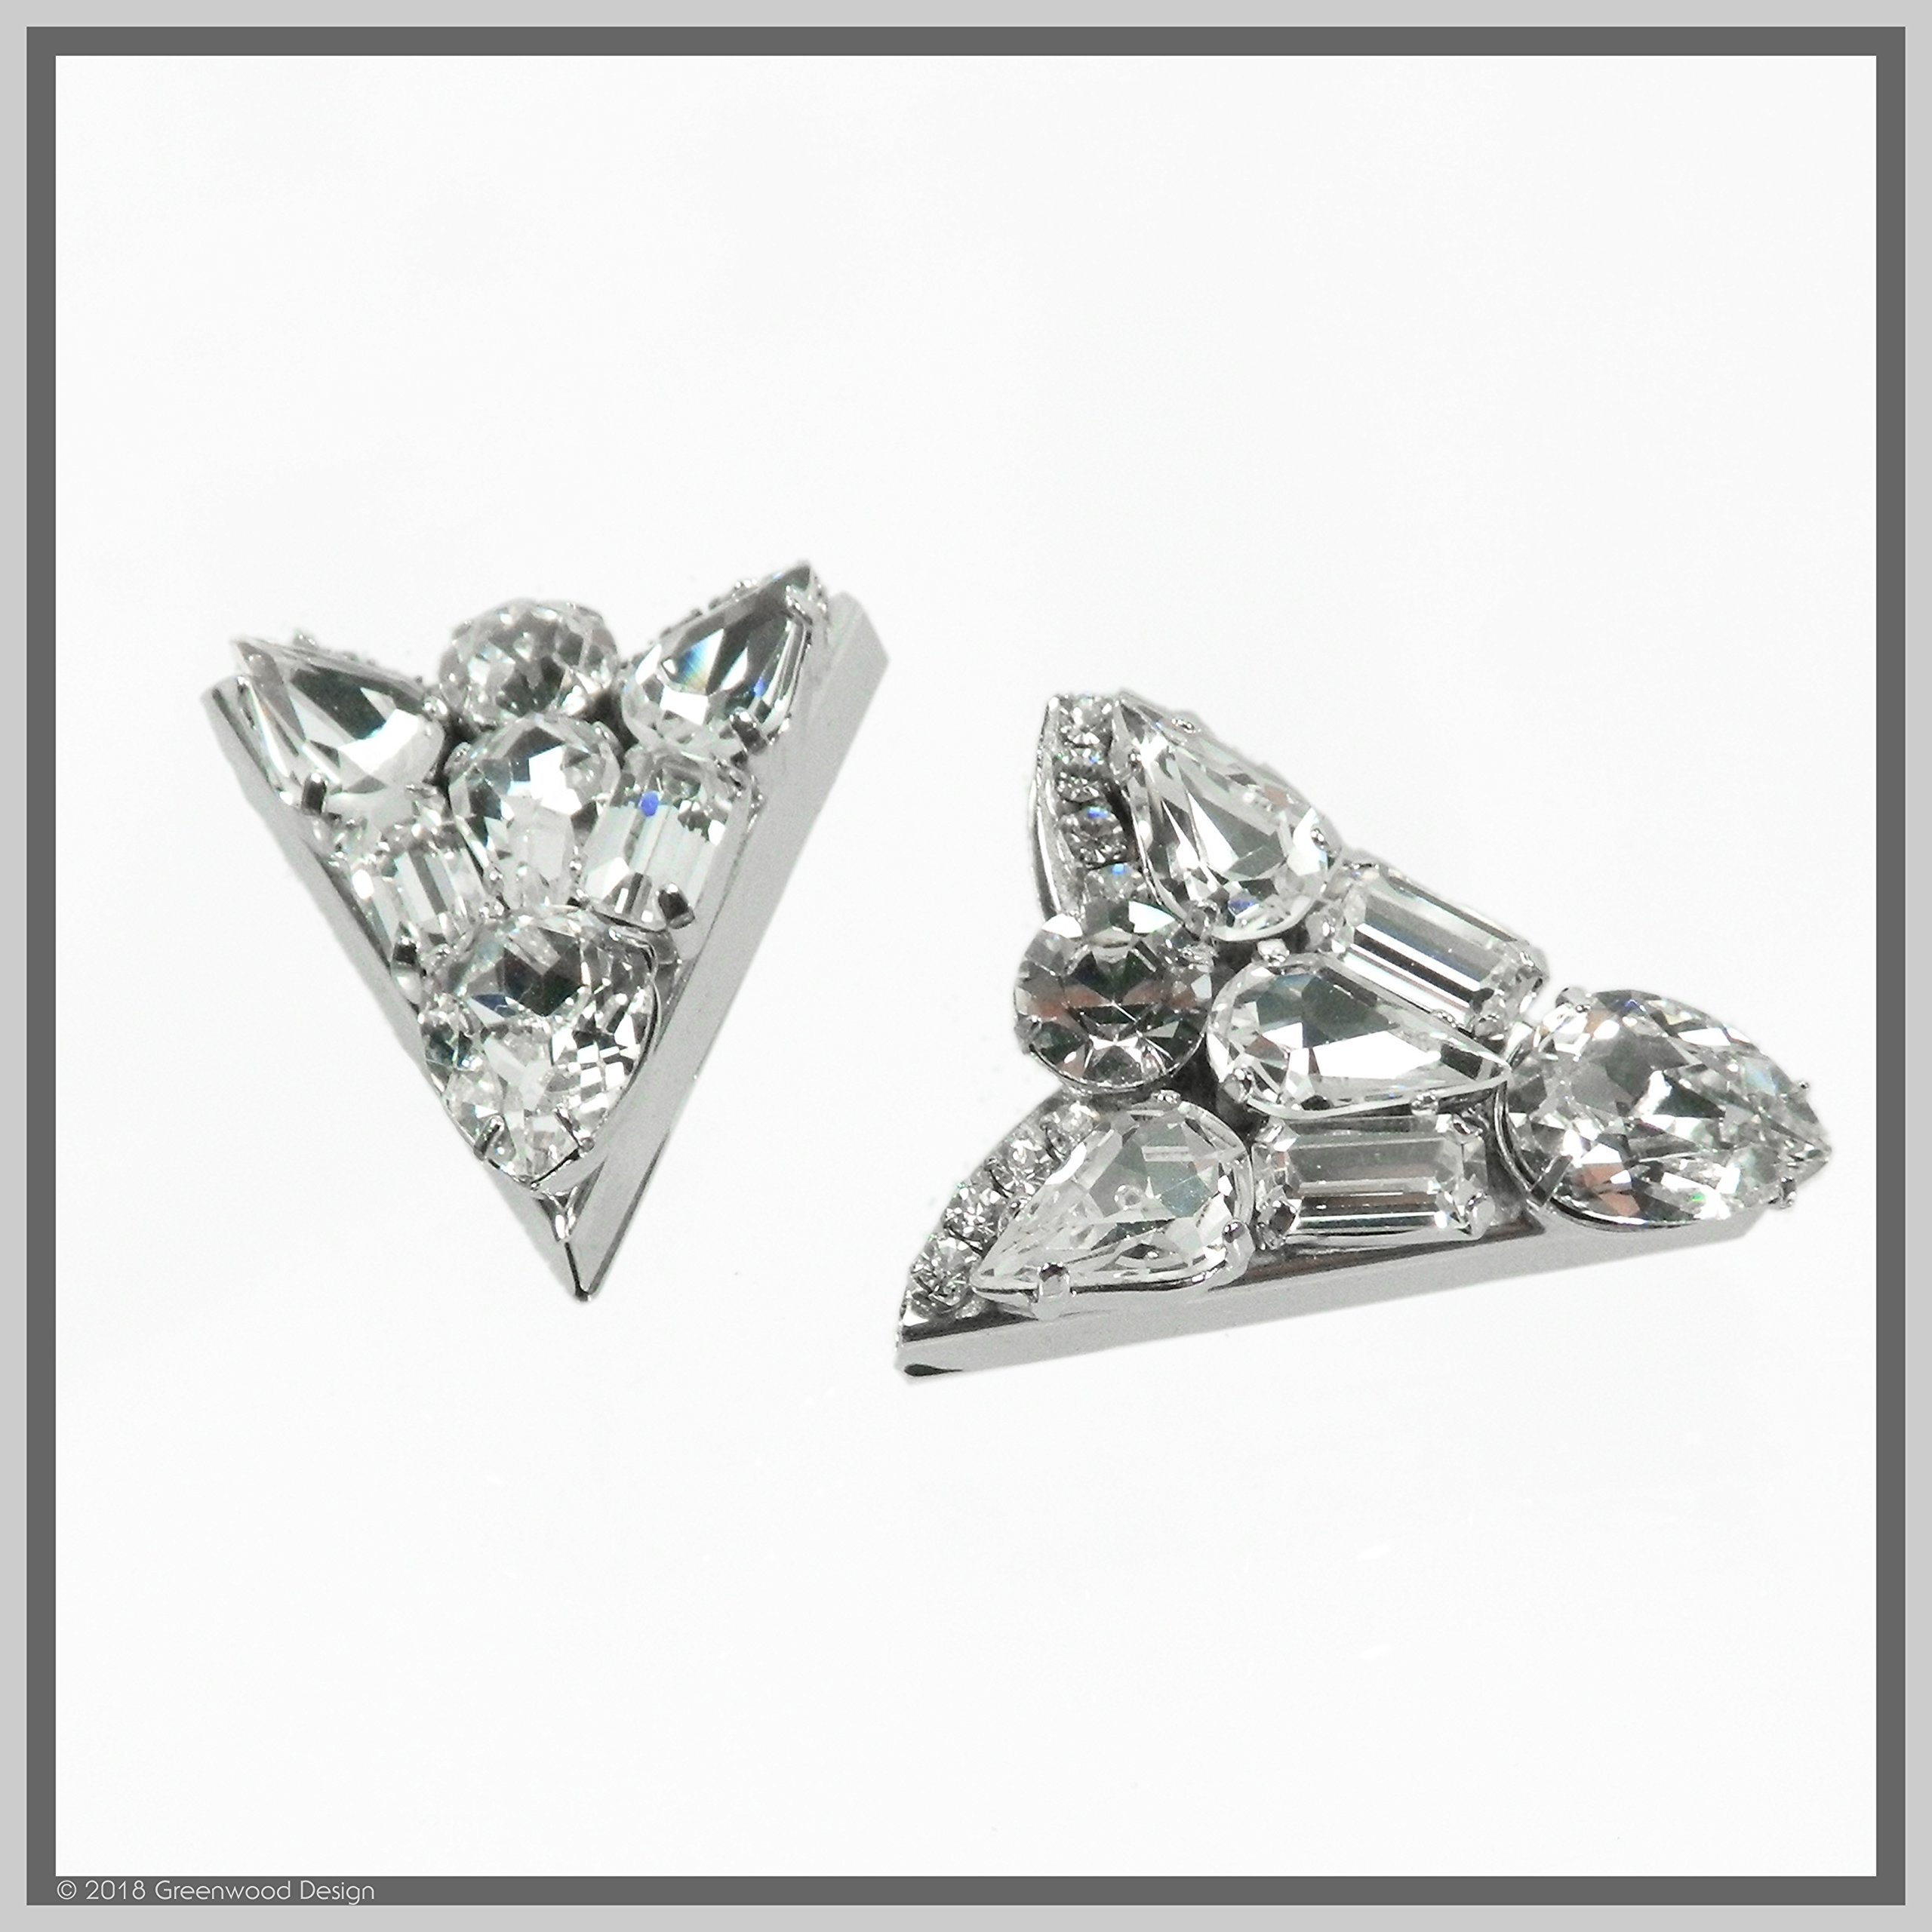 Vintage Antique Style Collar tips with Swarovski Crystal Western or Formal wear